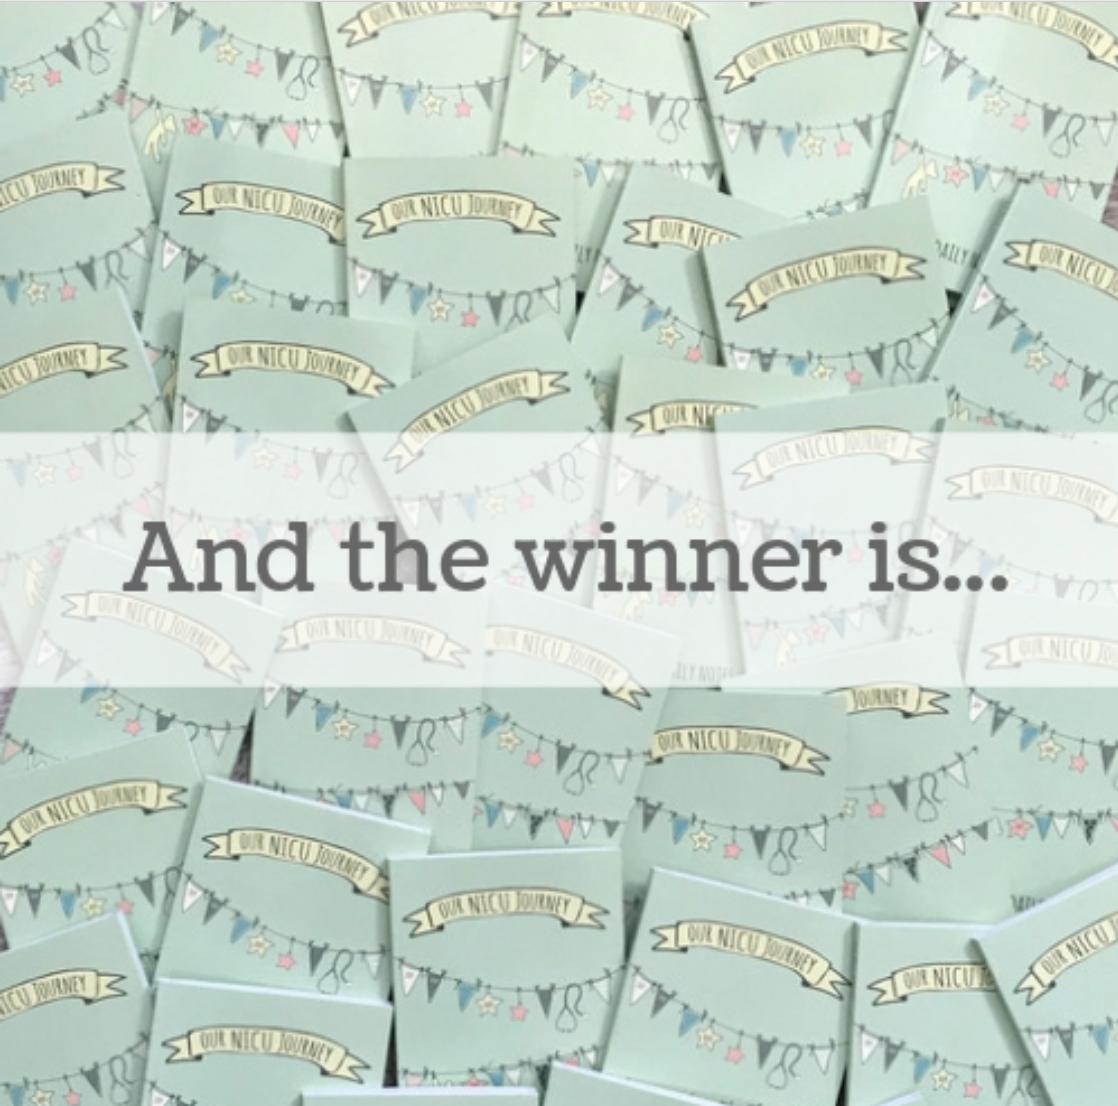 winner of nicu journal contest